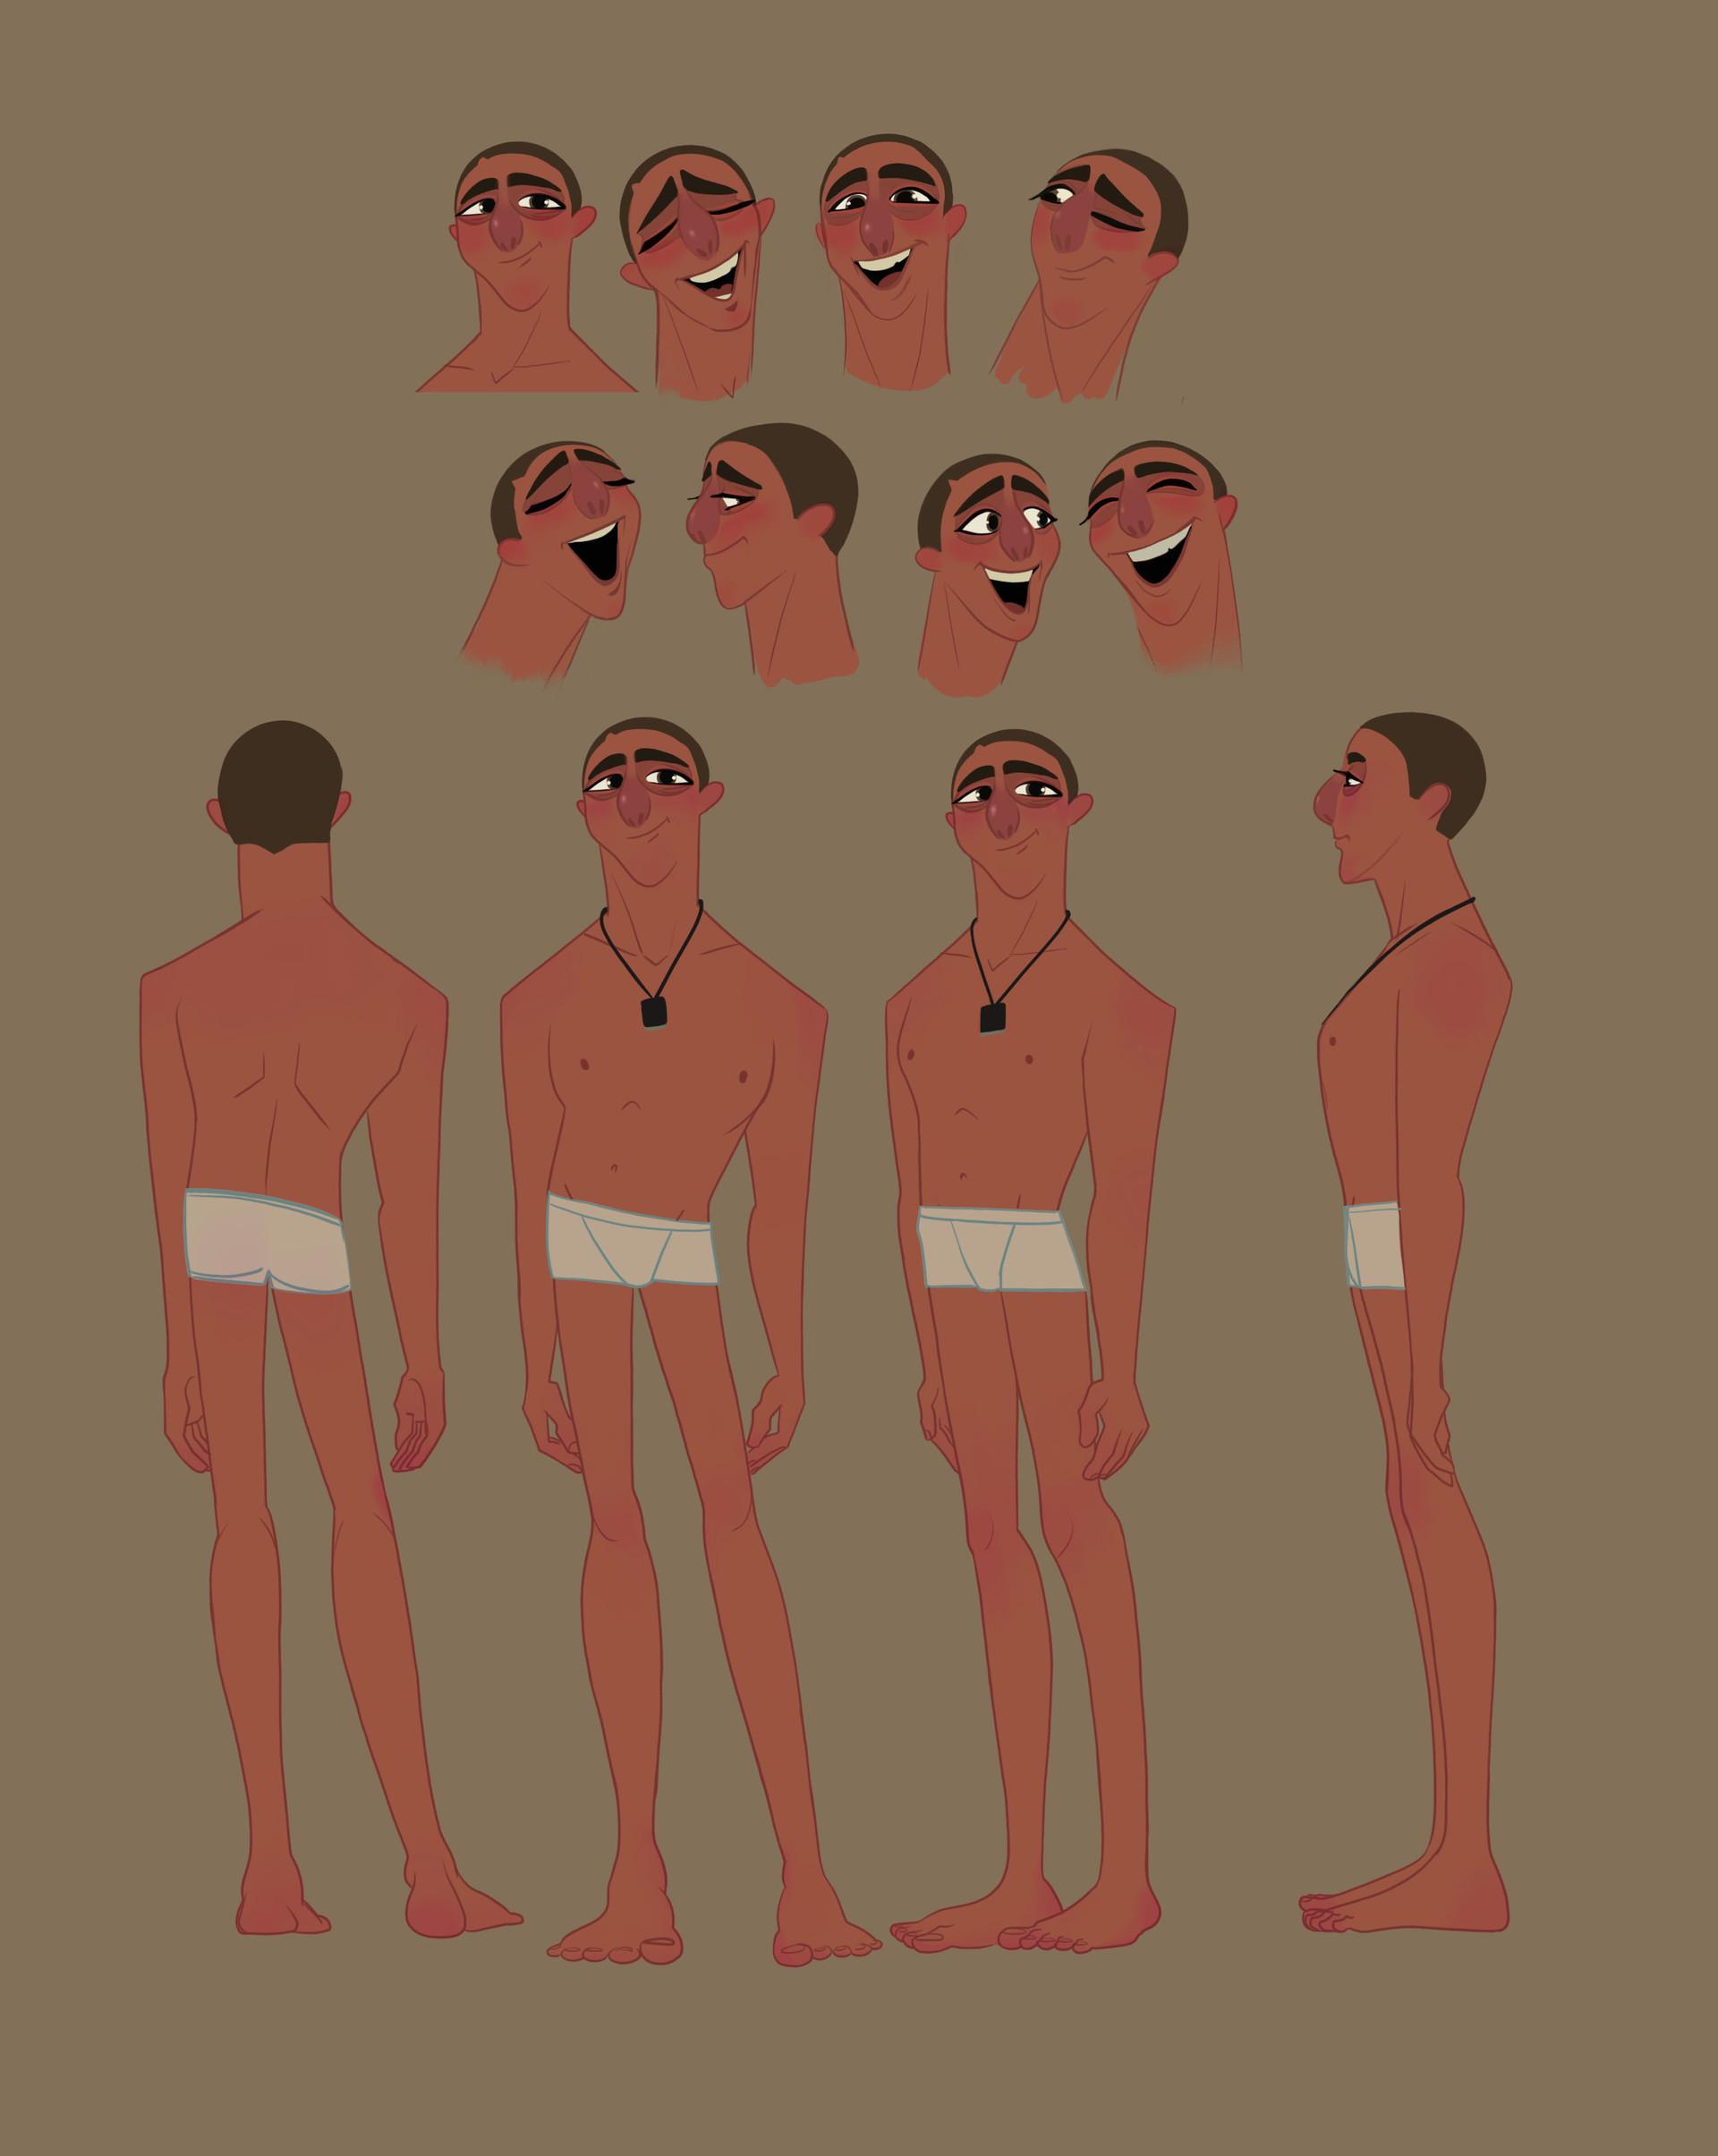 Mayan engelman yosi charcter